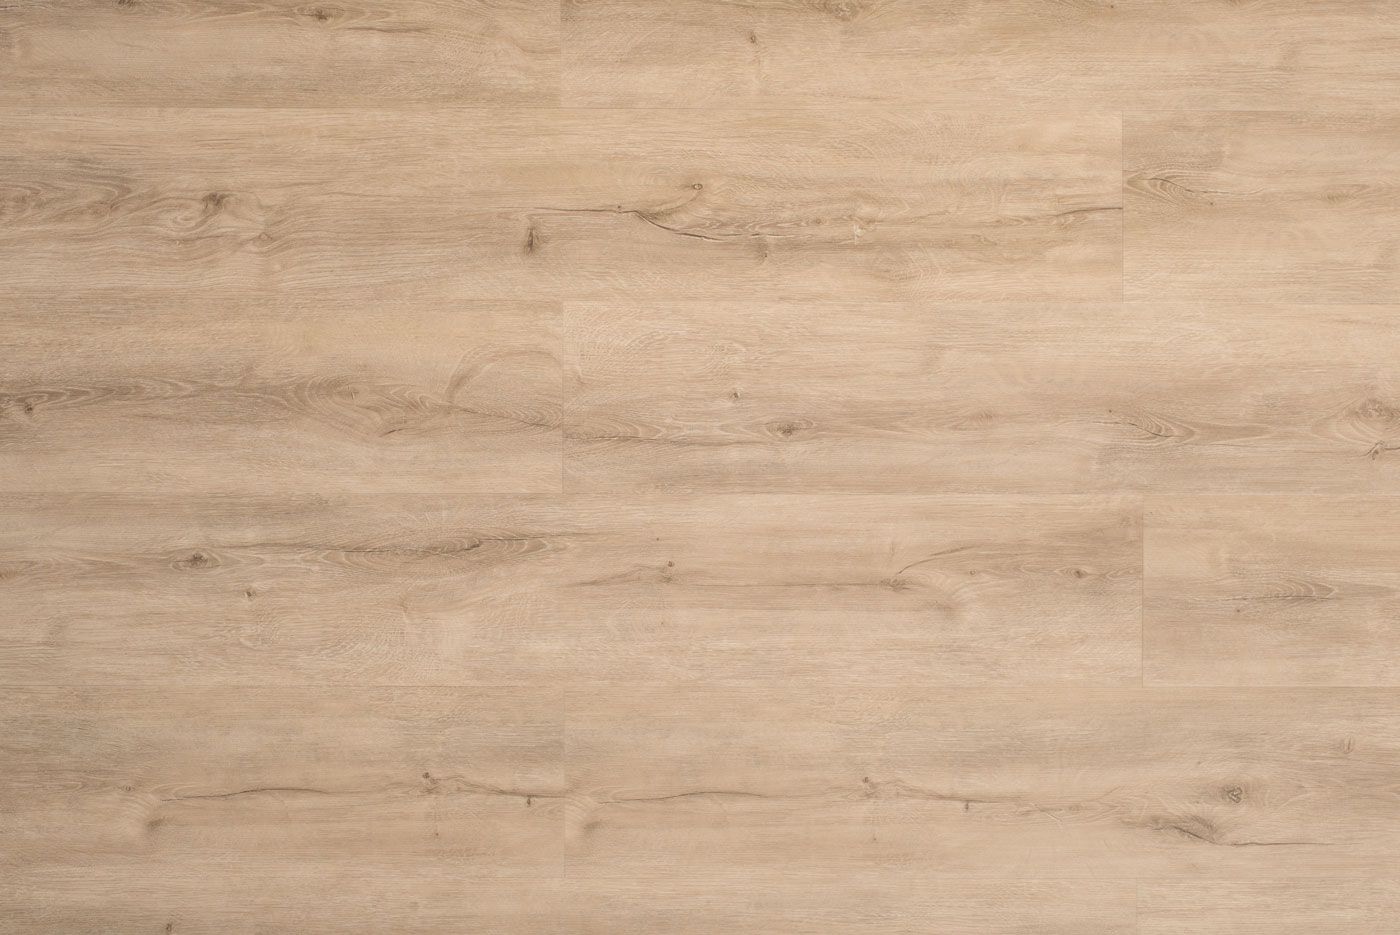 Floer dorpen pvc onnen onbehandeld eiken vinyl plank vloer